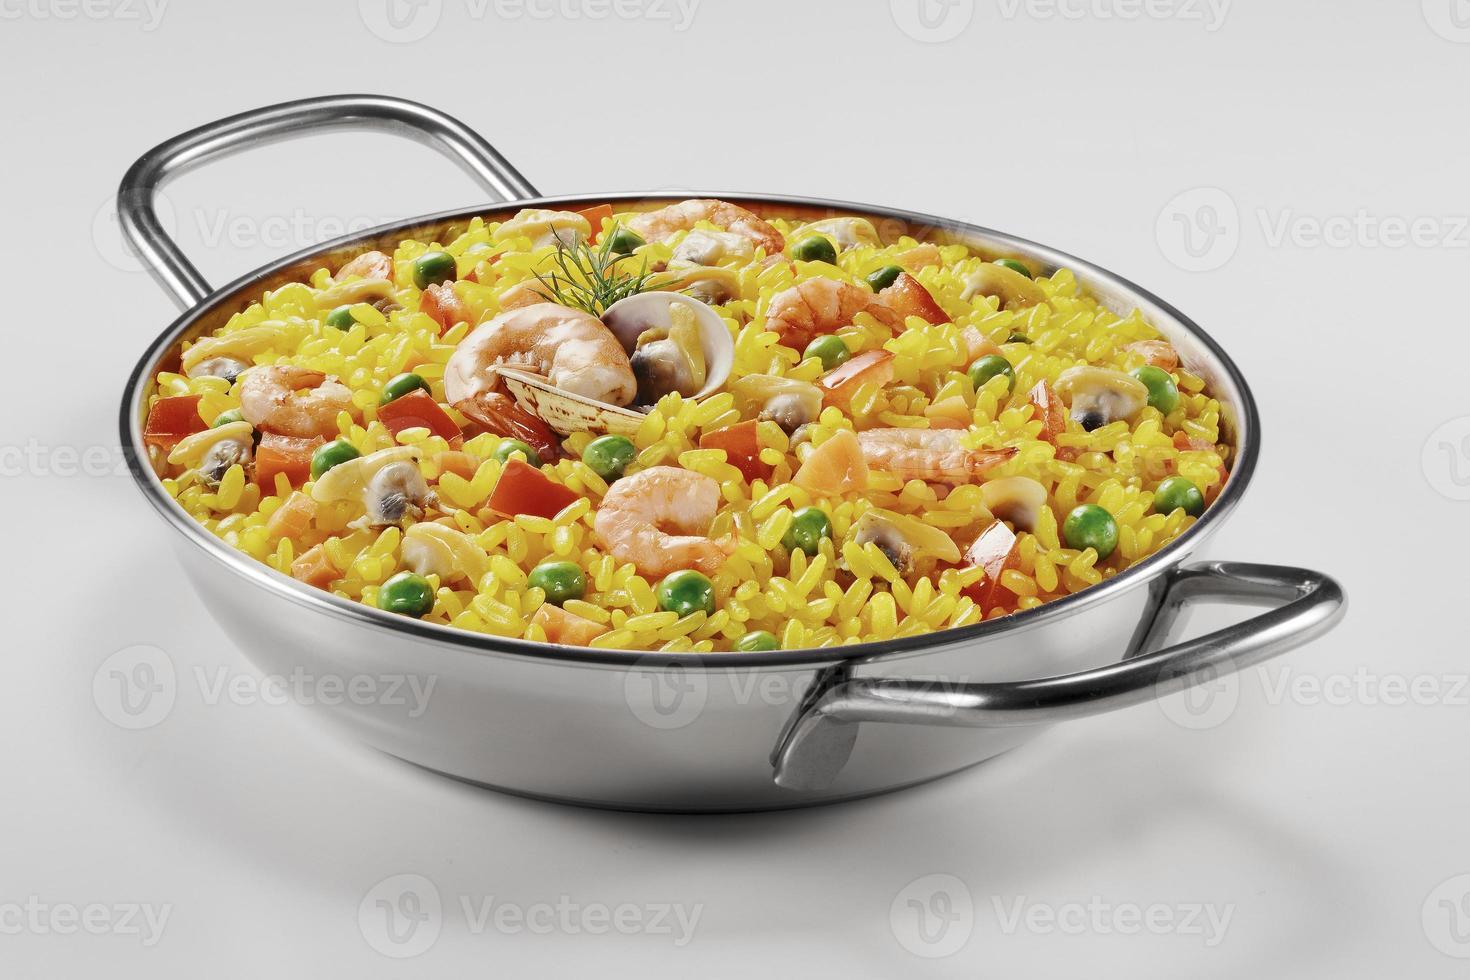 petite paella dans une casserole photo